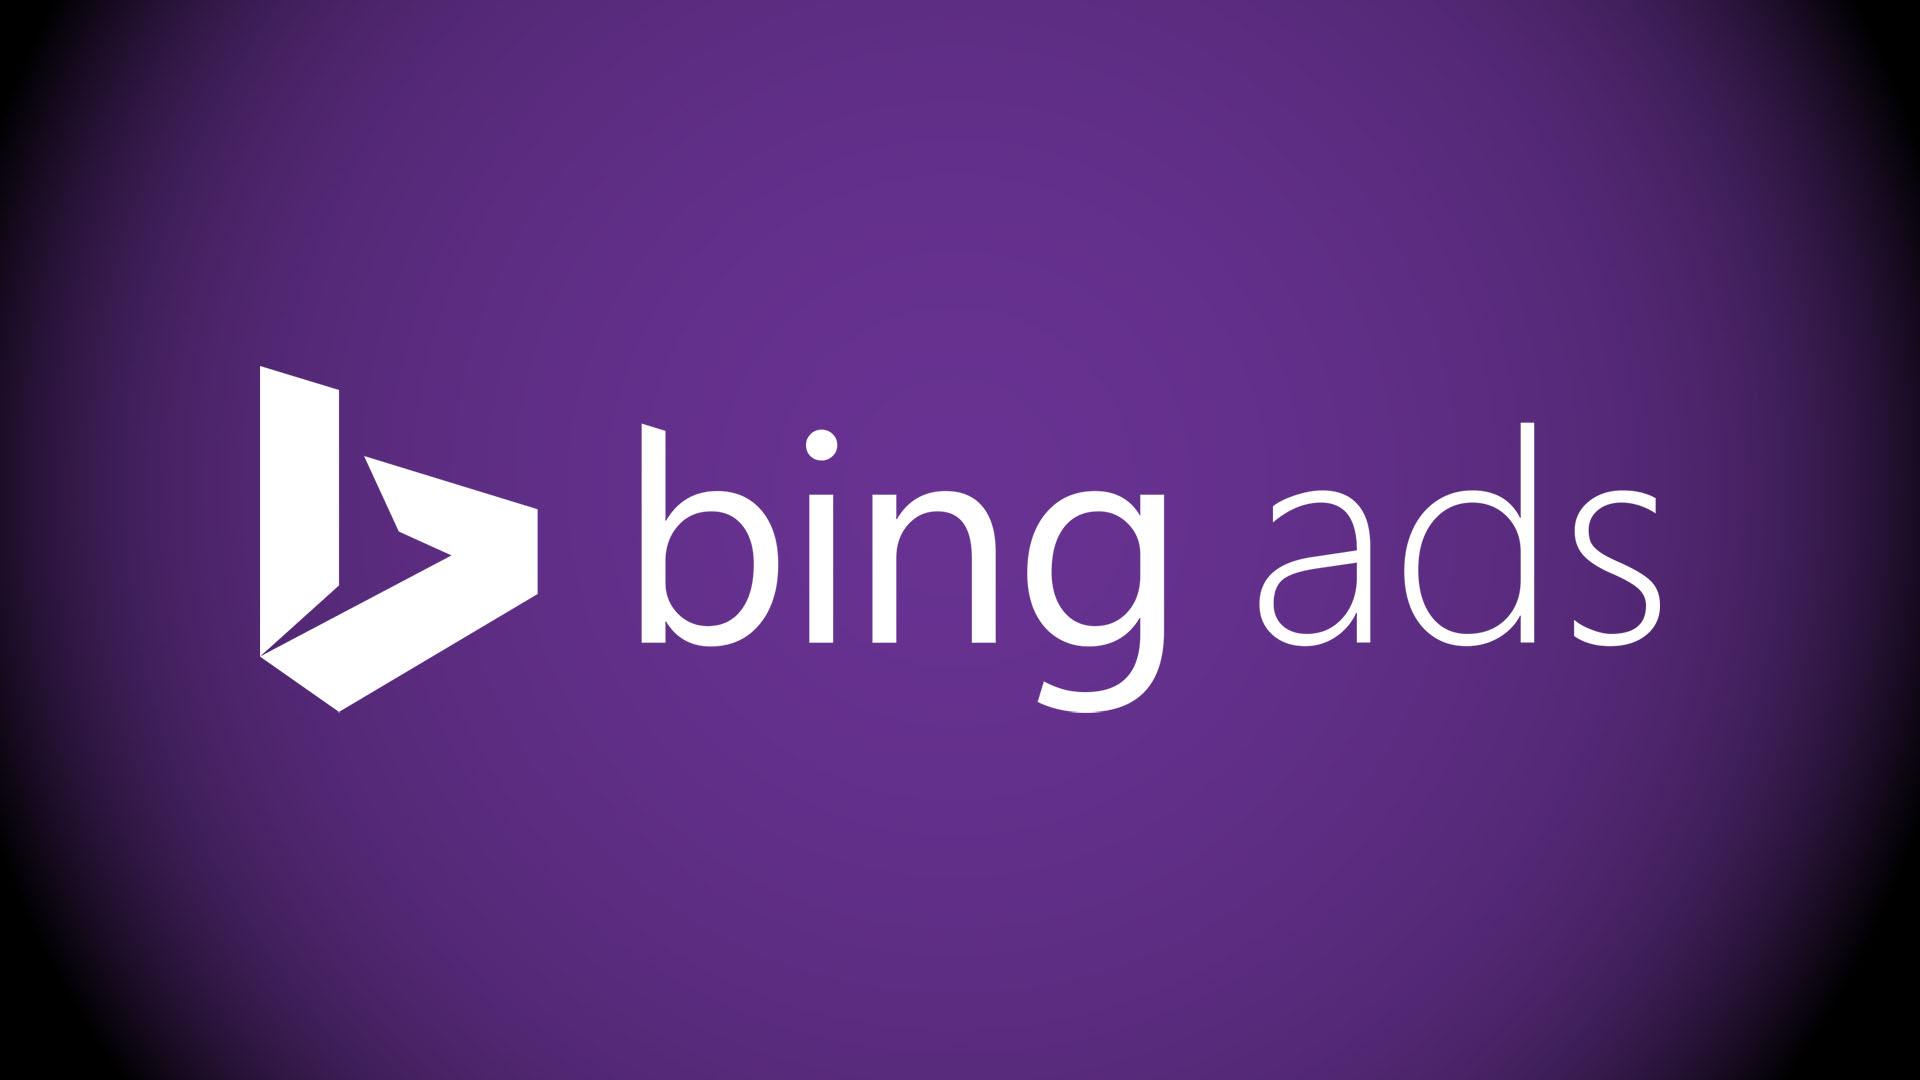 bing-ads-logo.jpg